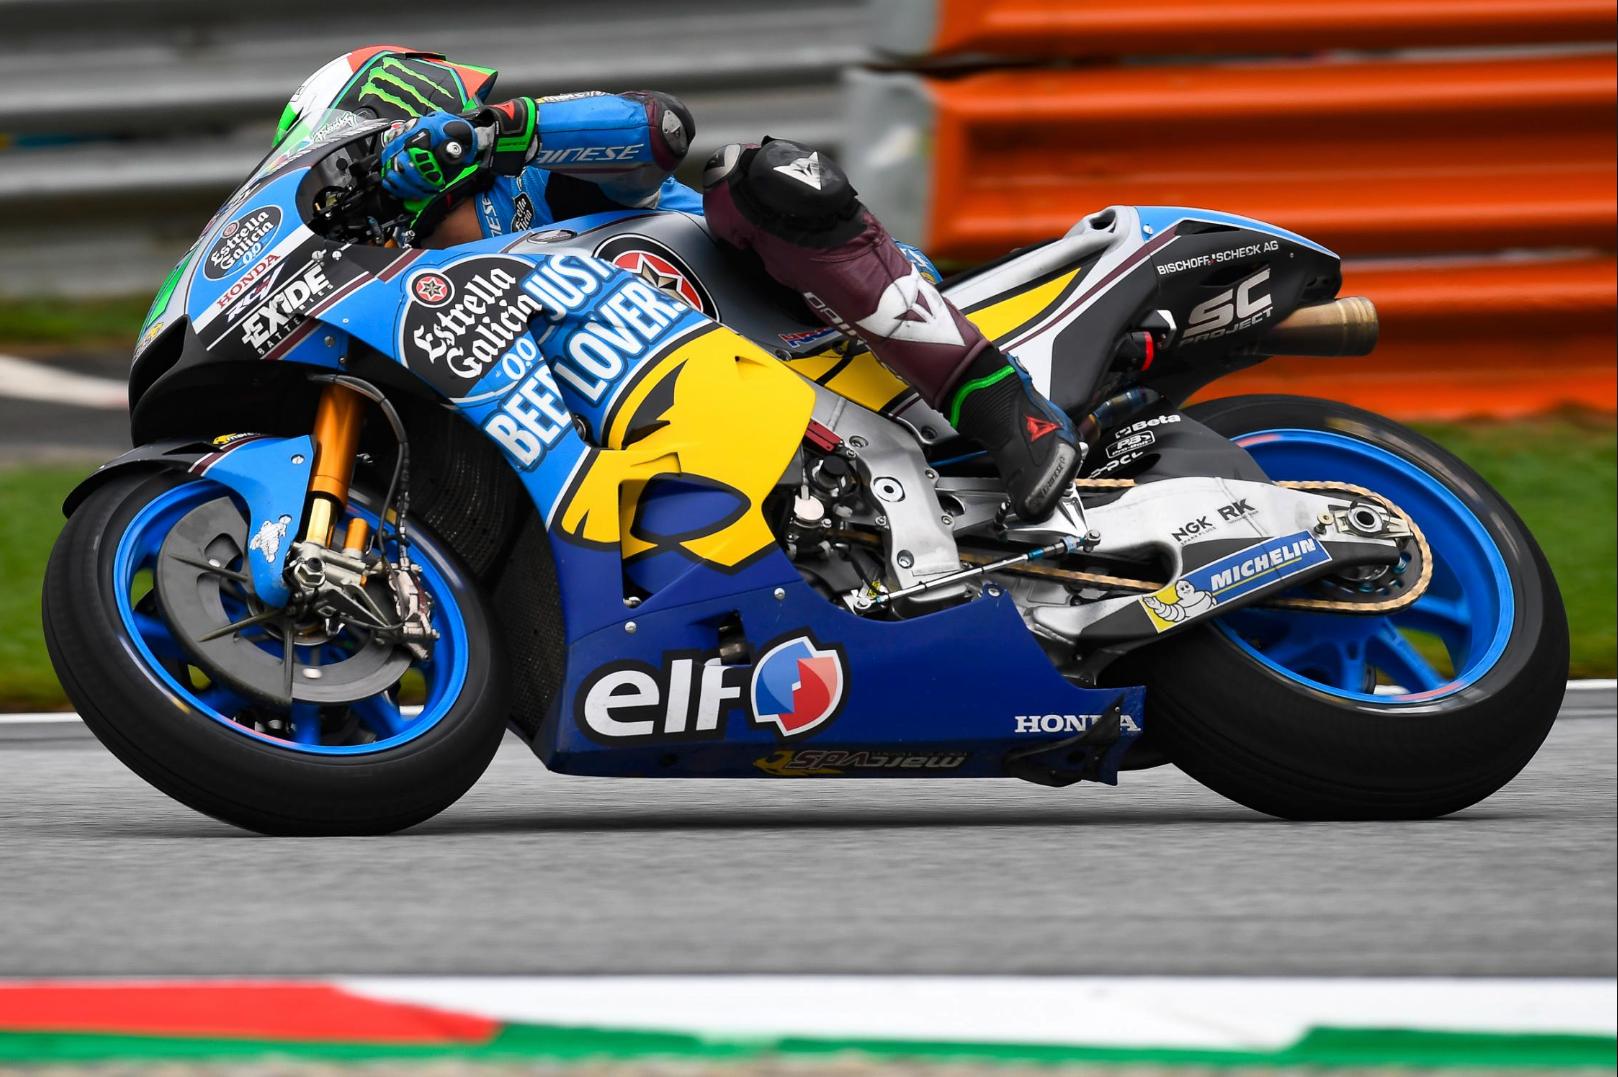 2019 Sic Yamaha Motogp Team Signs Franco Morbidelli And Fabio